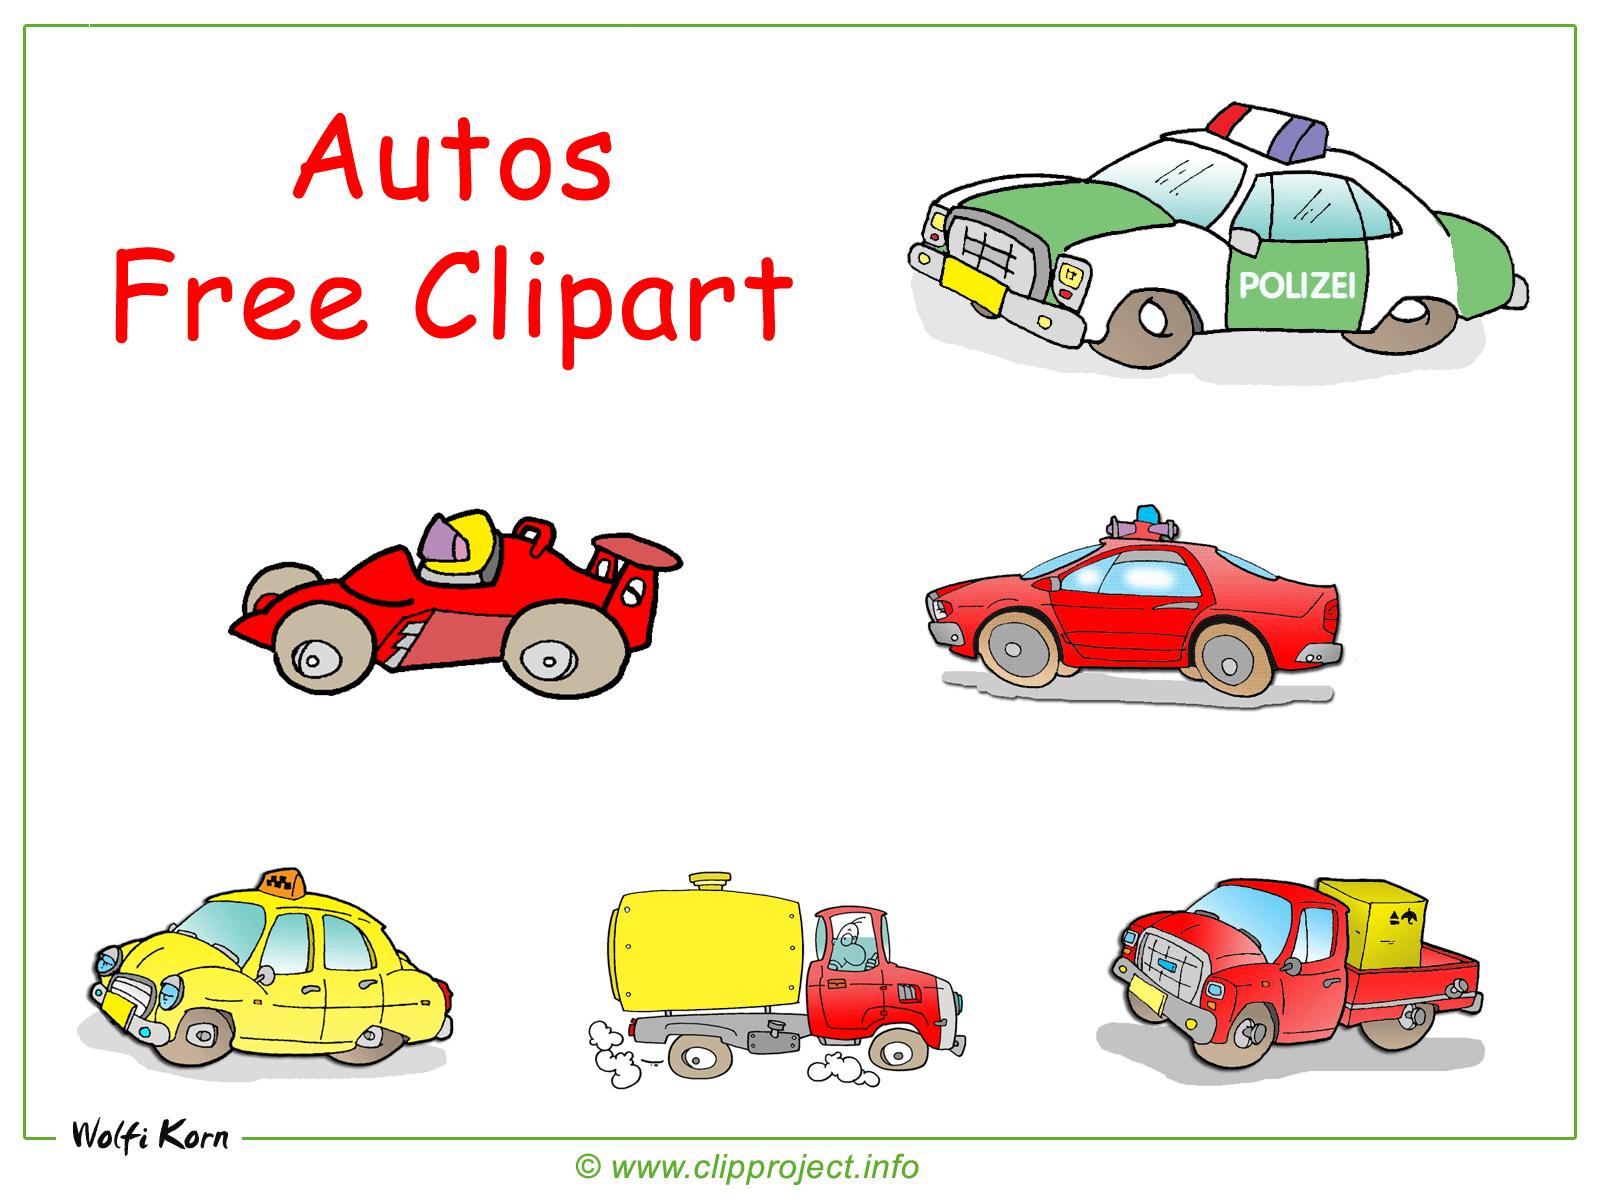 Autos clipart.